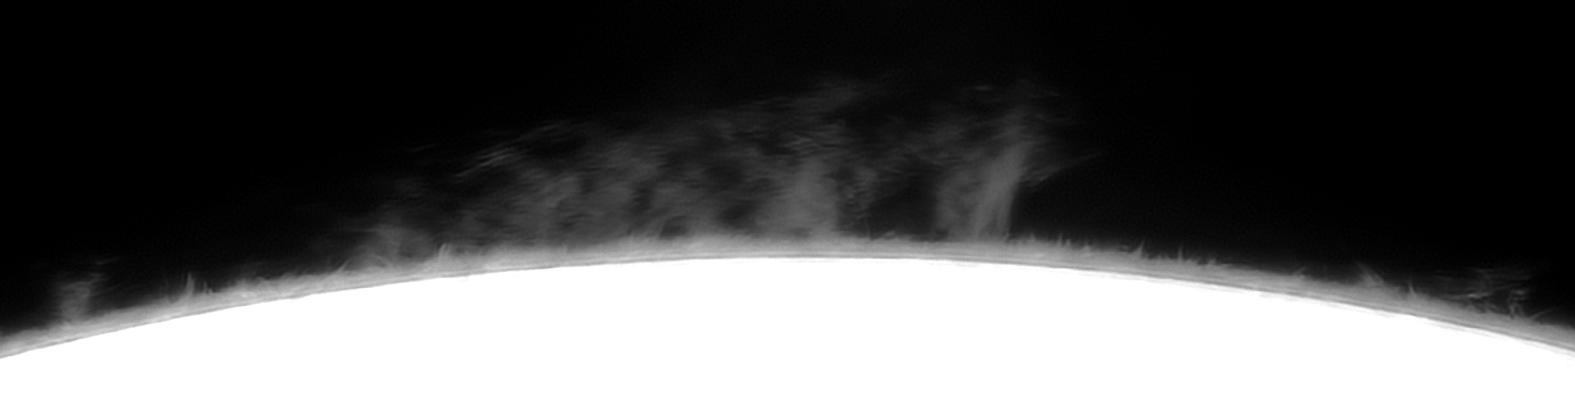 sun_h-alpha_07-01-2021_reso0.3.jpg.34369c928b9d6db1f90acfca004b46fc.jpg